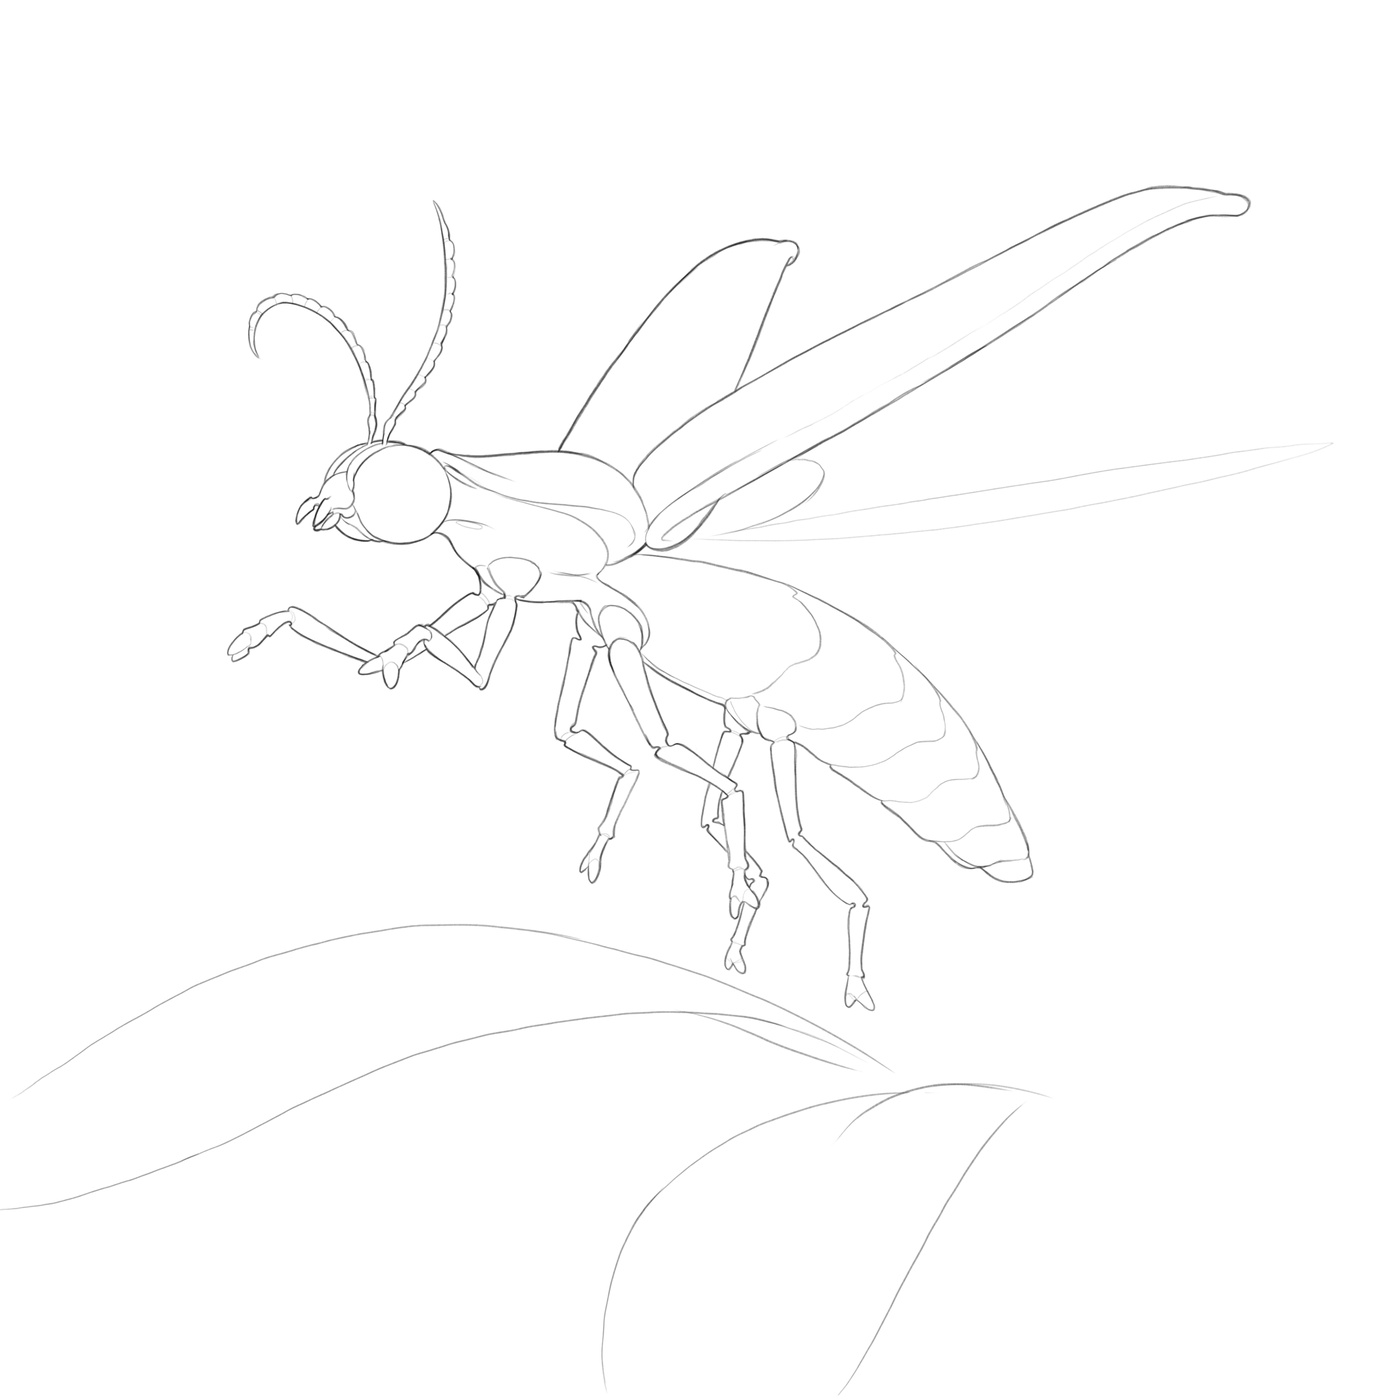 line art final render sketch glowing insect creature design model render glow effect photoshop